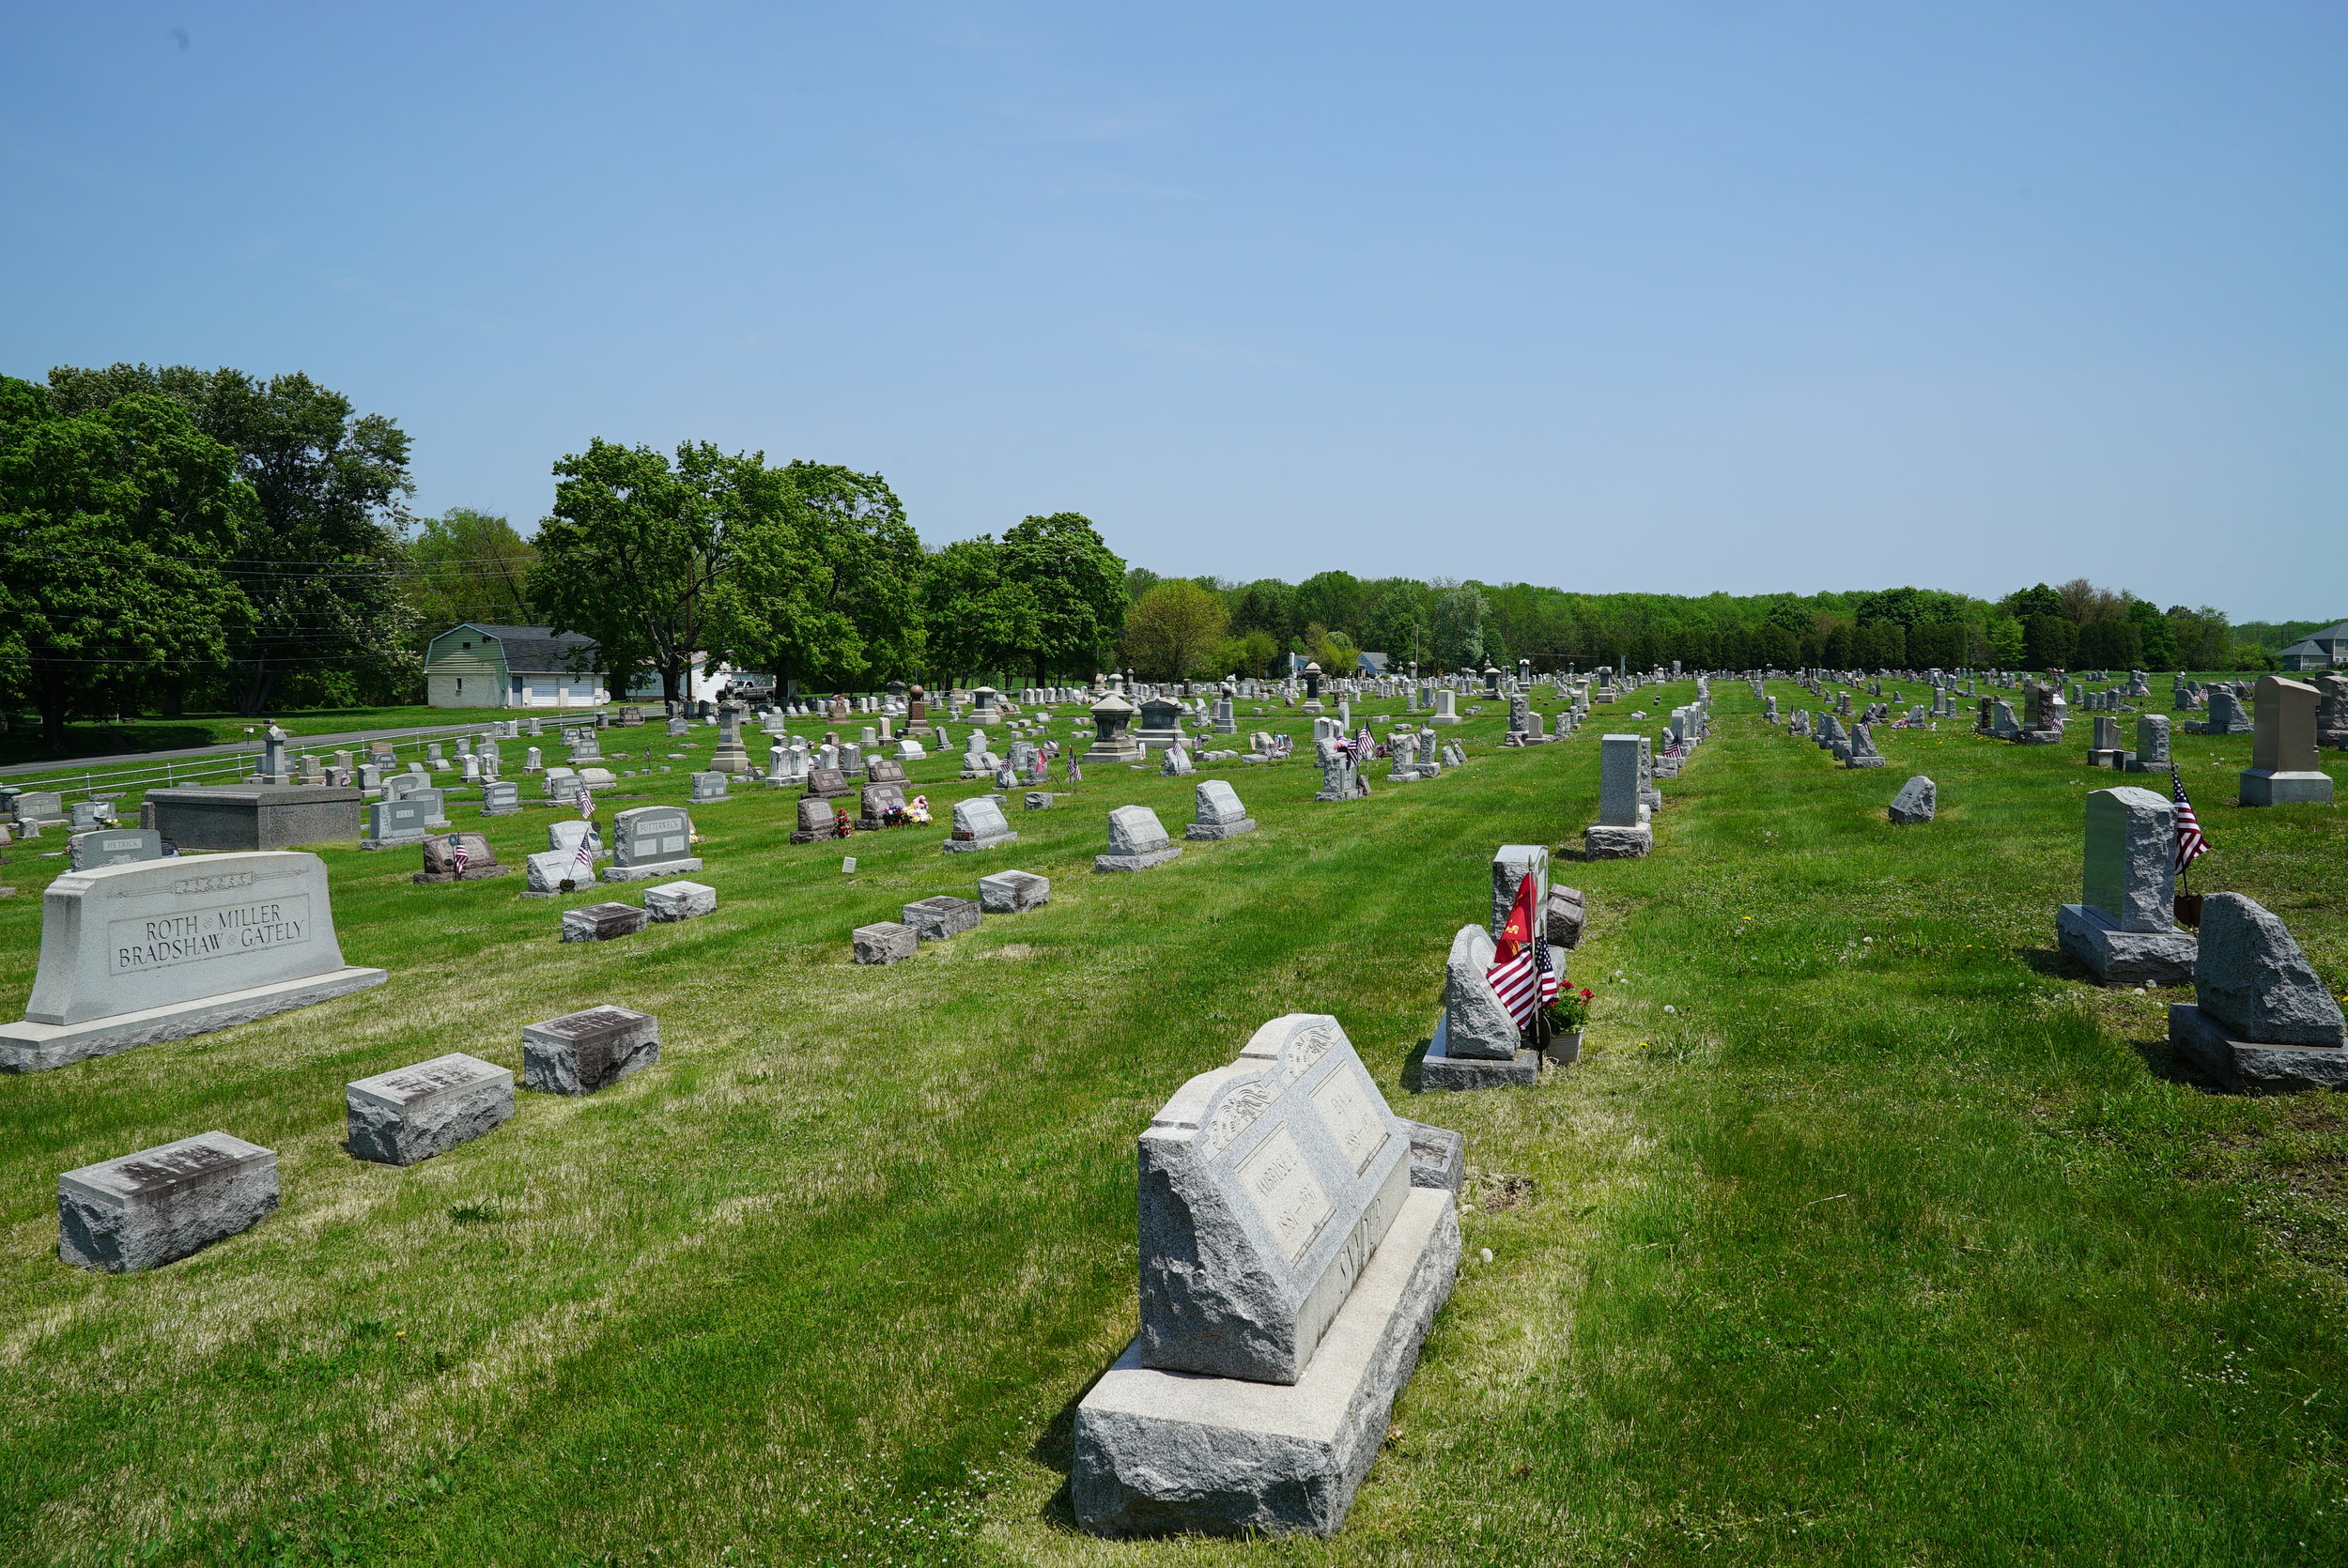 St. Paul's Lutheran Church Cemetery. Pennsburg area. Montgomery County, Pennsylvania.